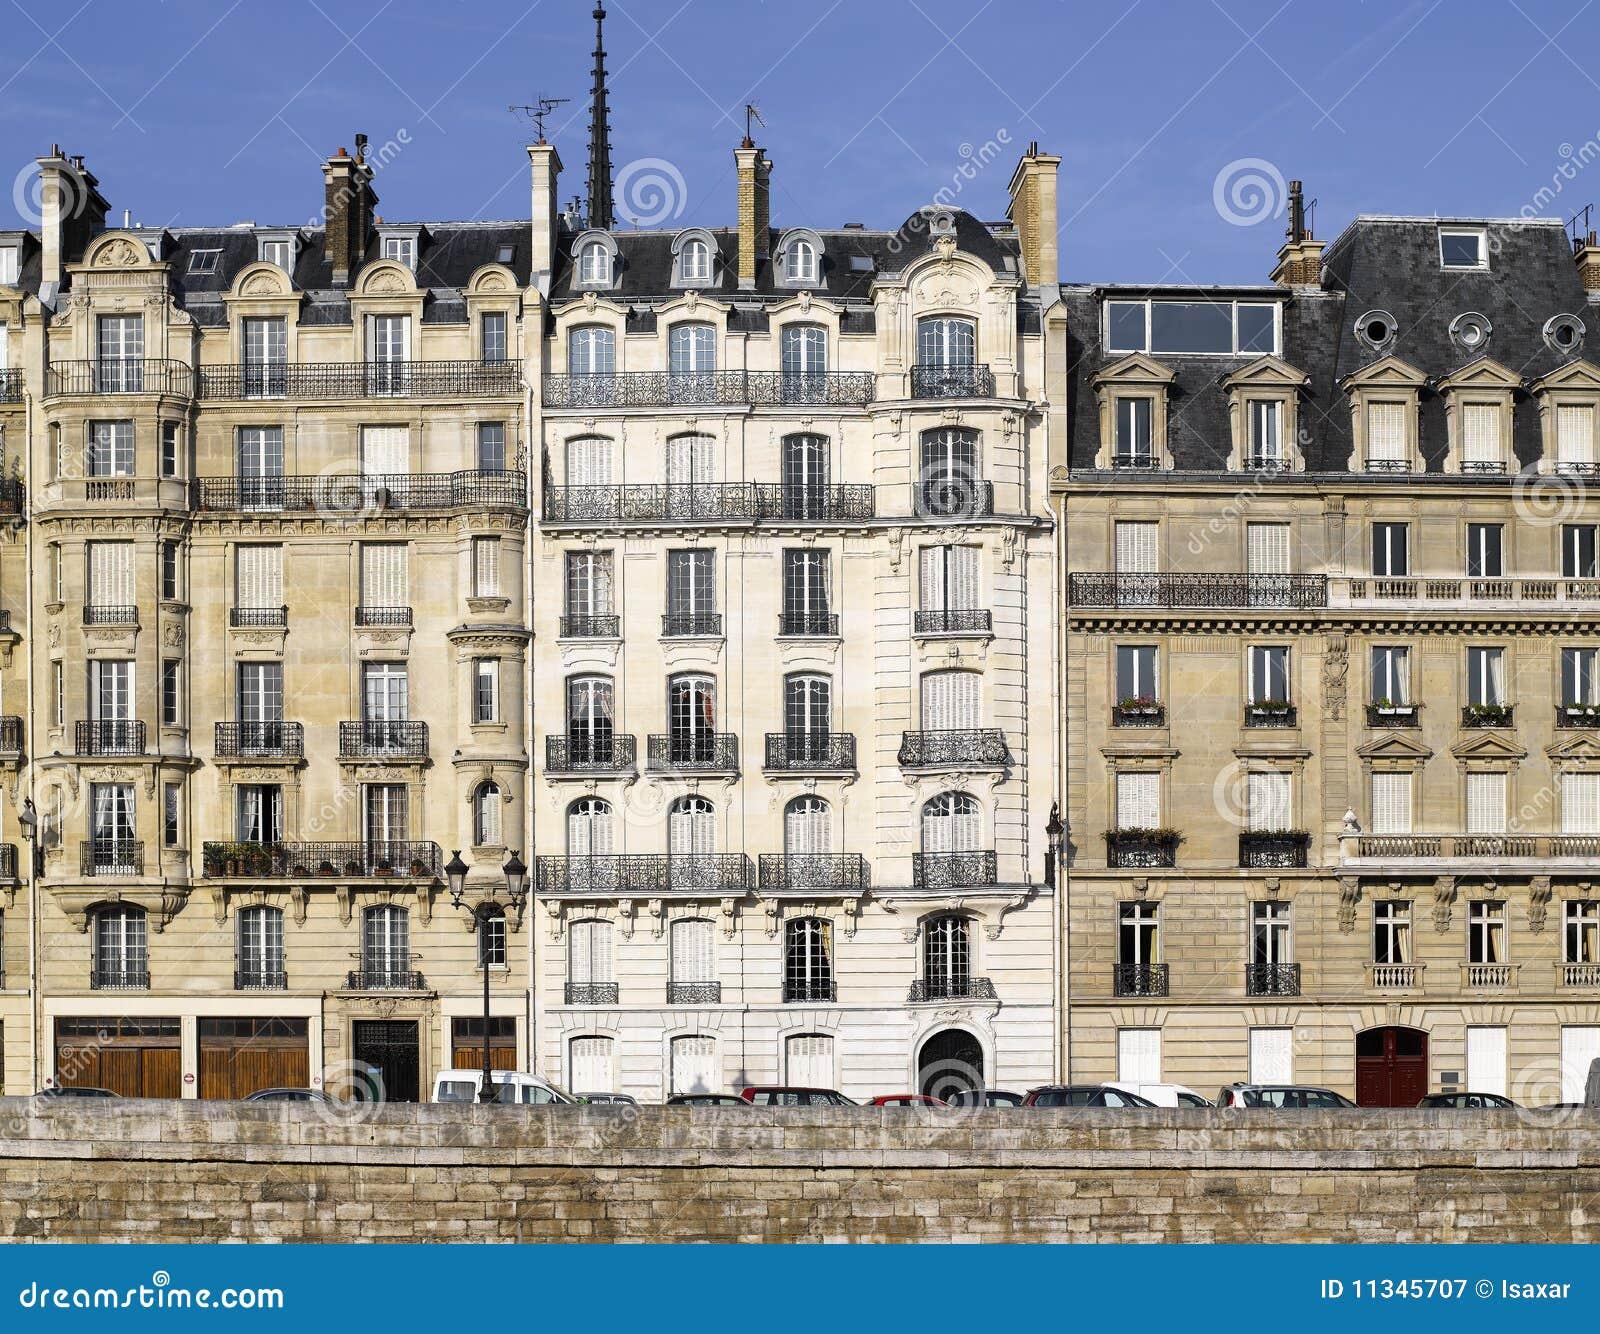 paris very nice facade of ile de la cite royalty free stock photography image 11345707. Black Bedroom Furniture Sets. Home Design Ideas